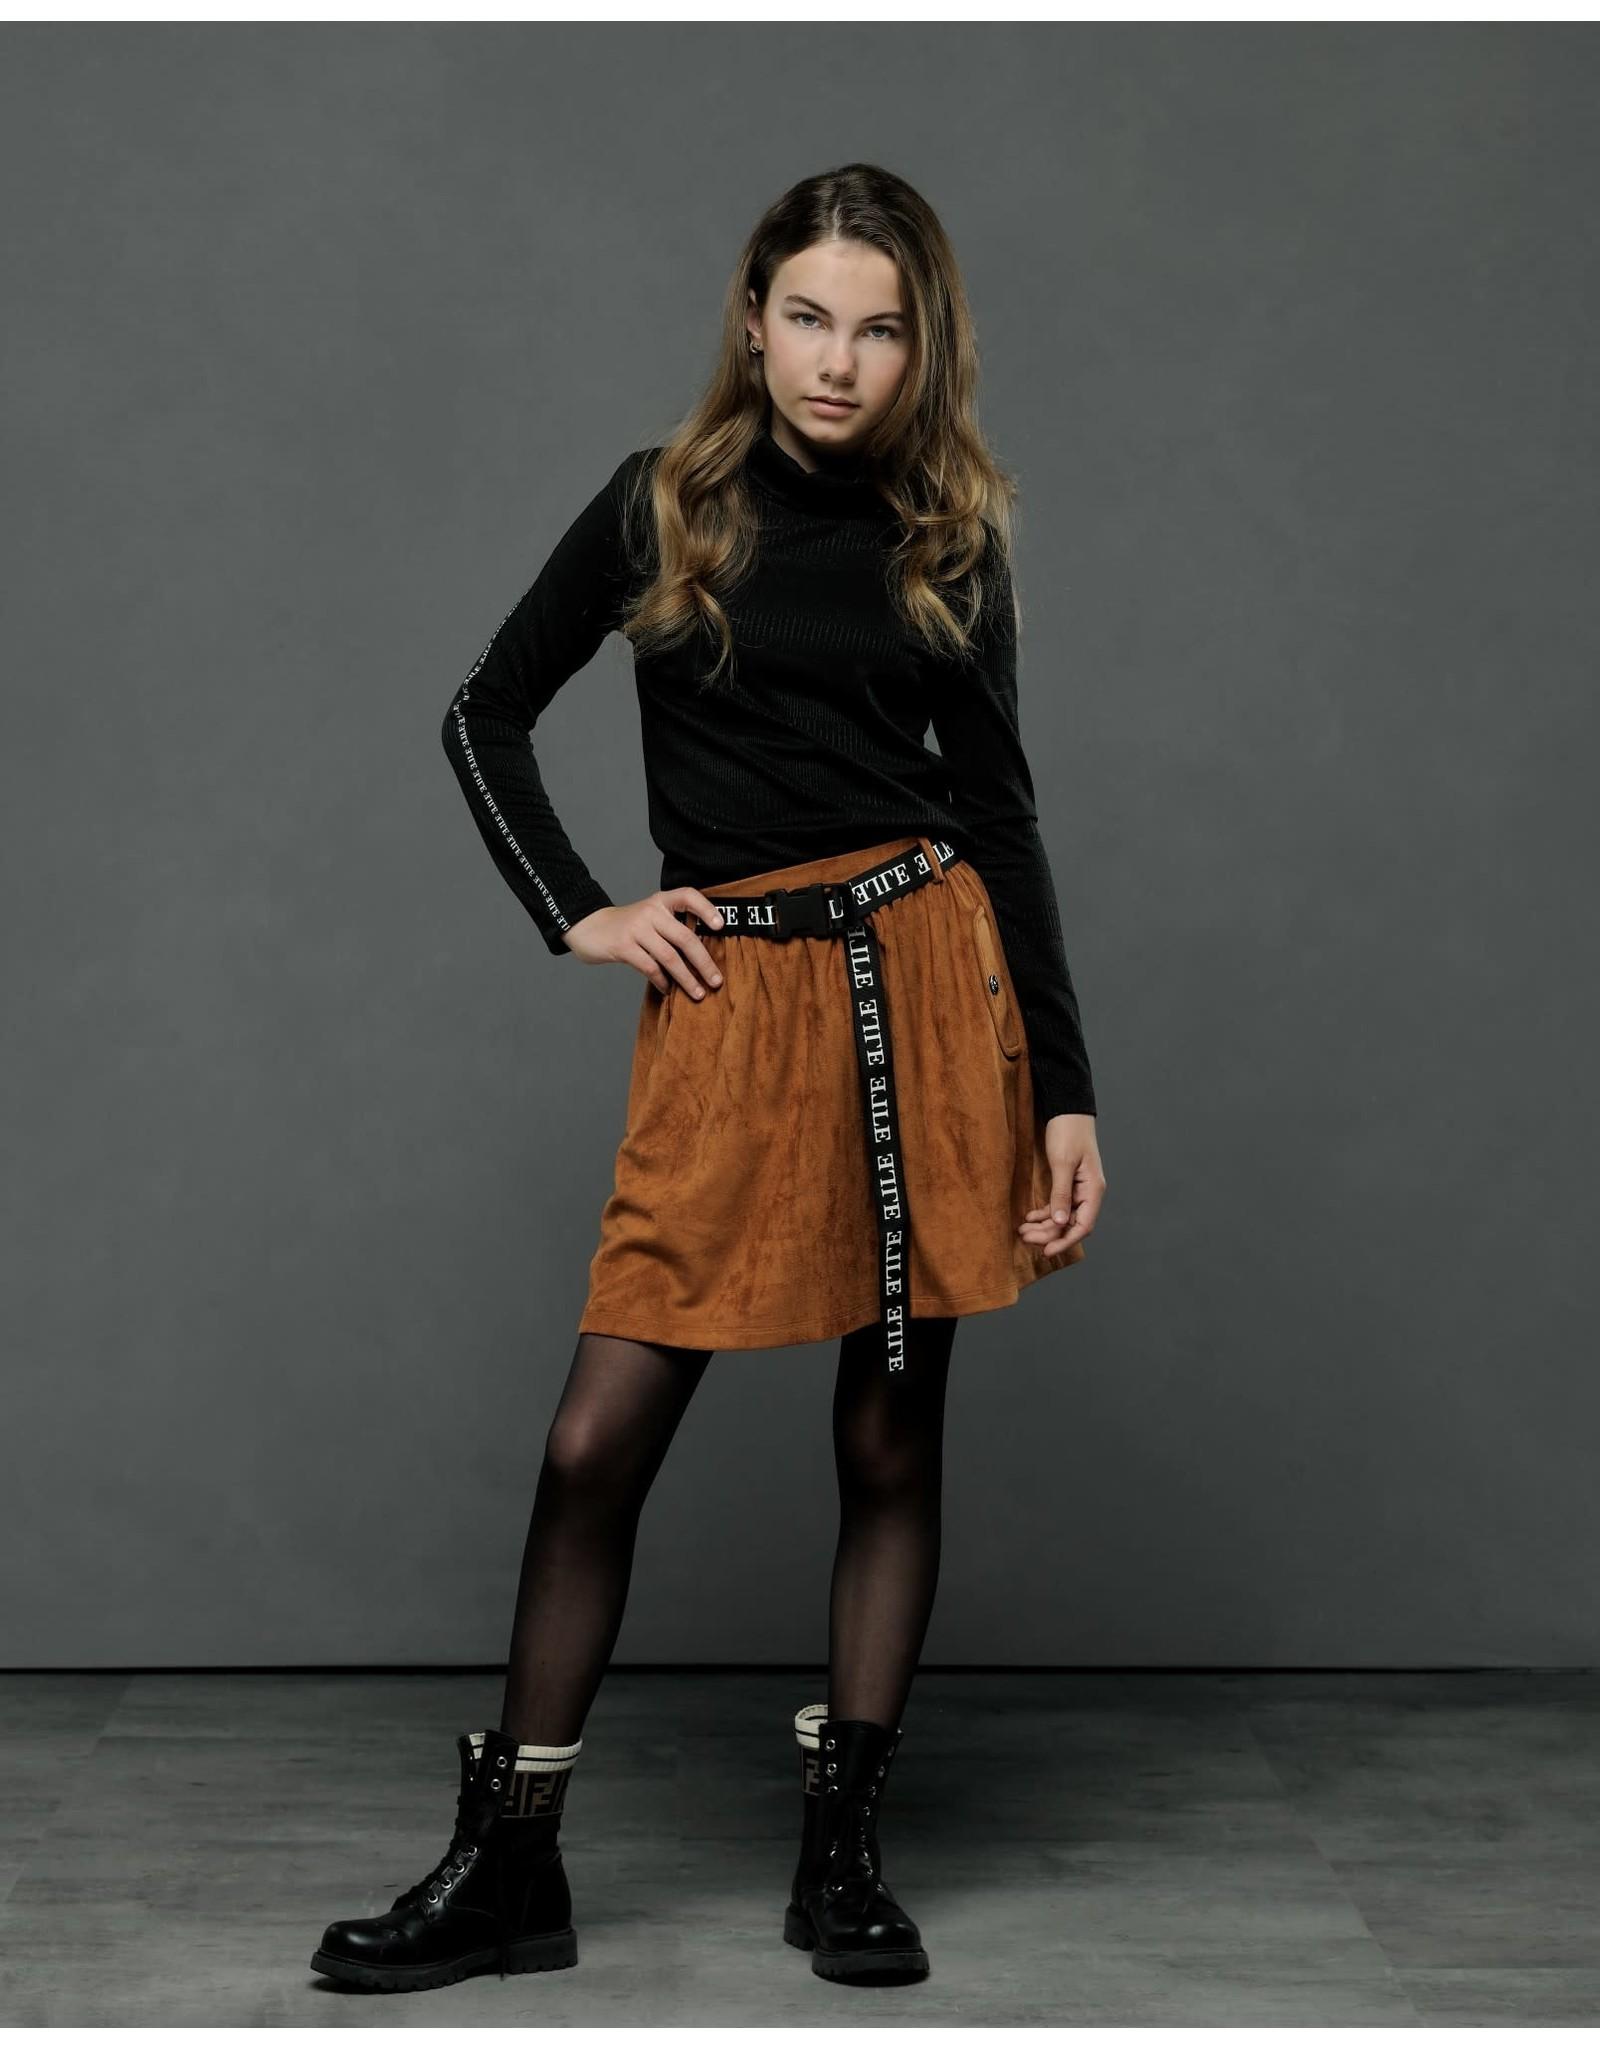 Elle Chic Elle Chic meiden coll shirt Naima Black